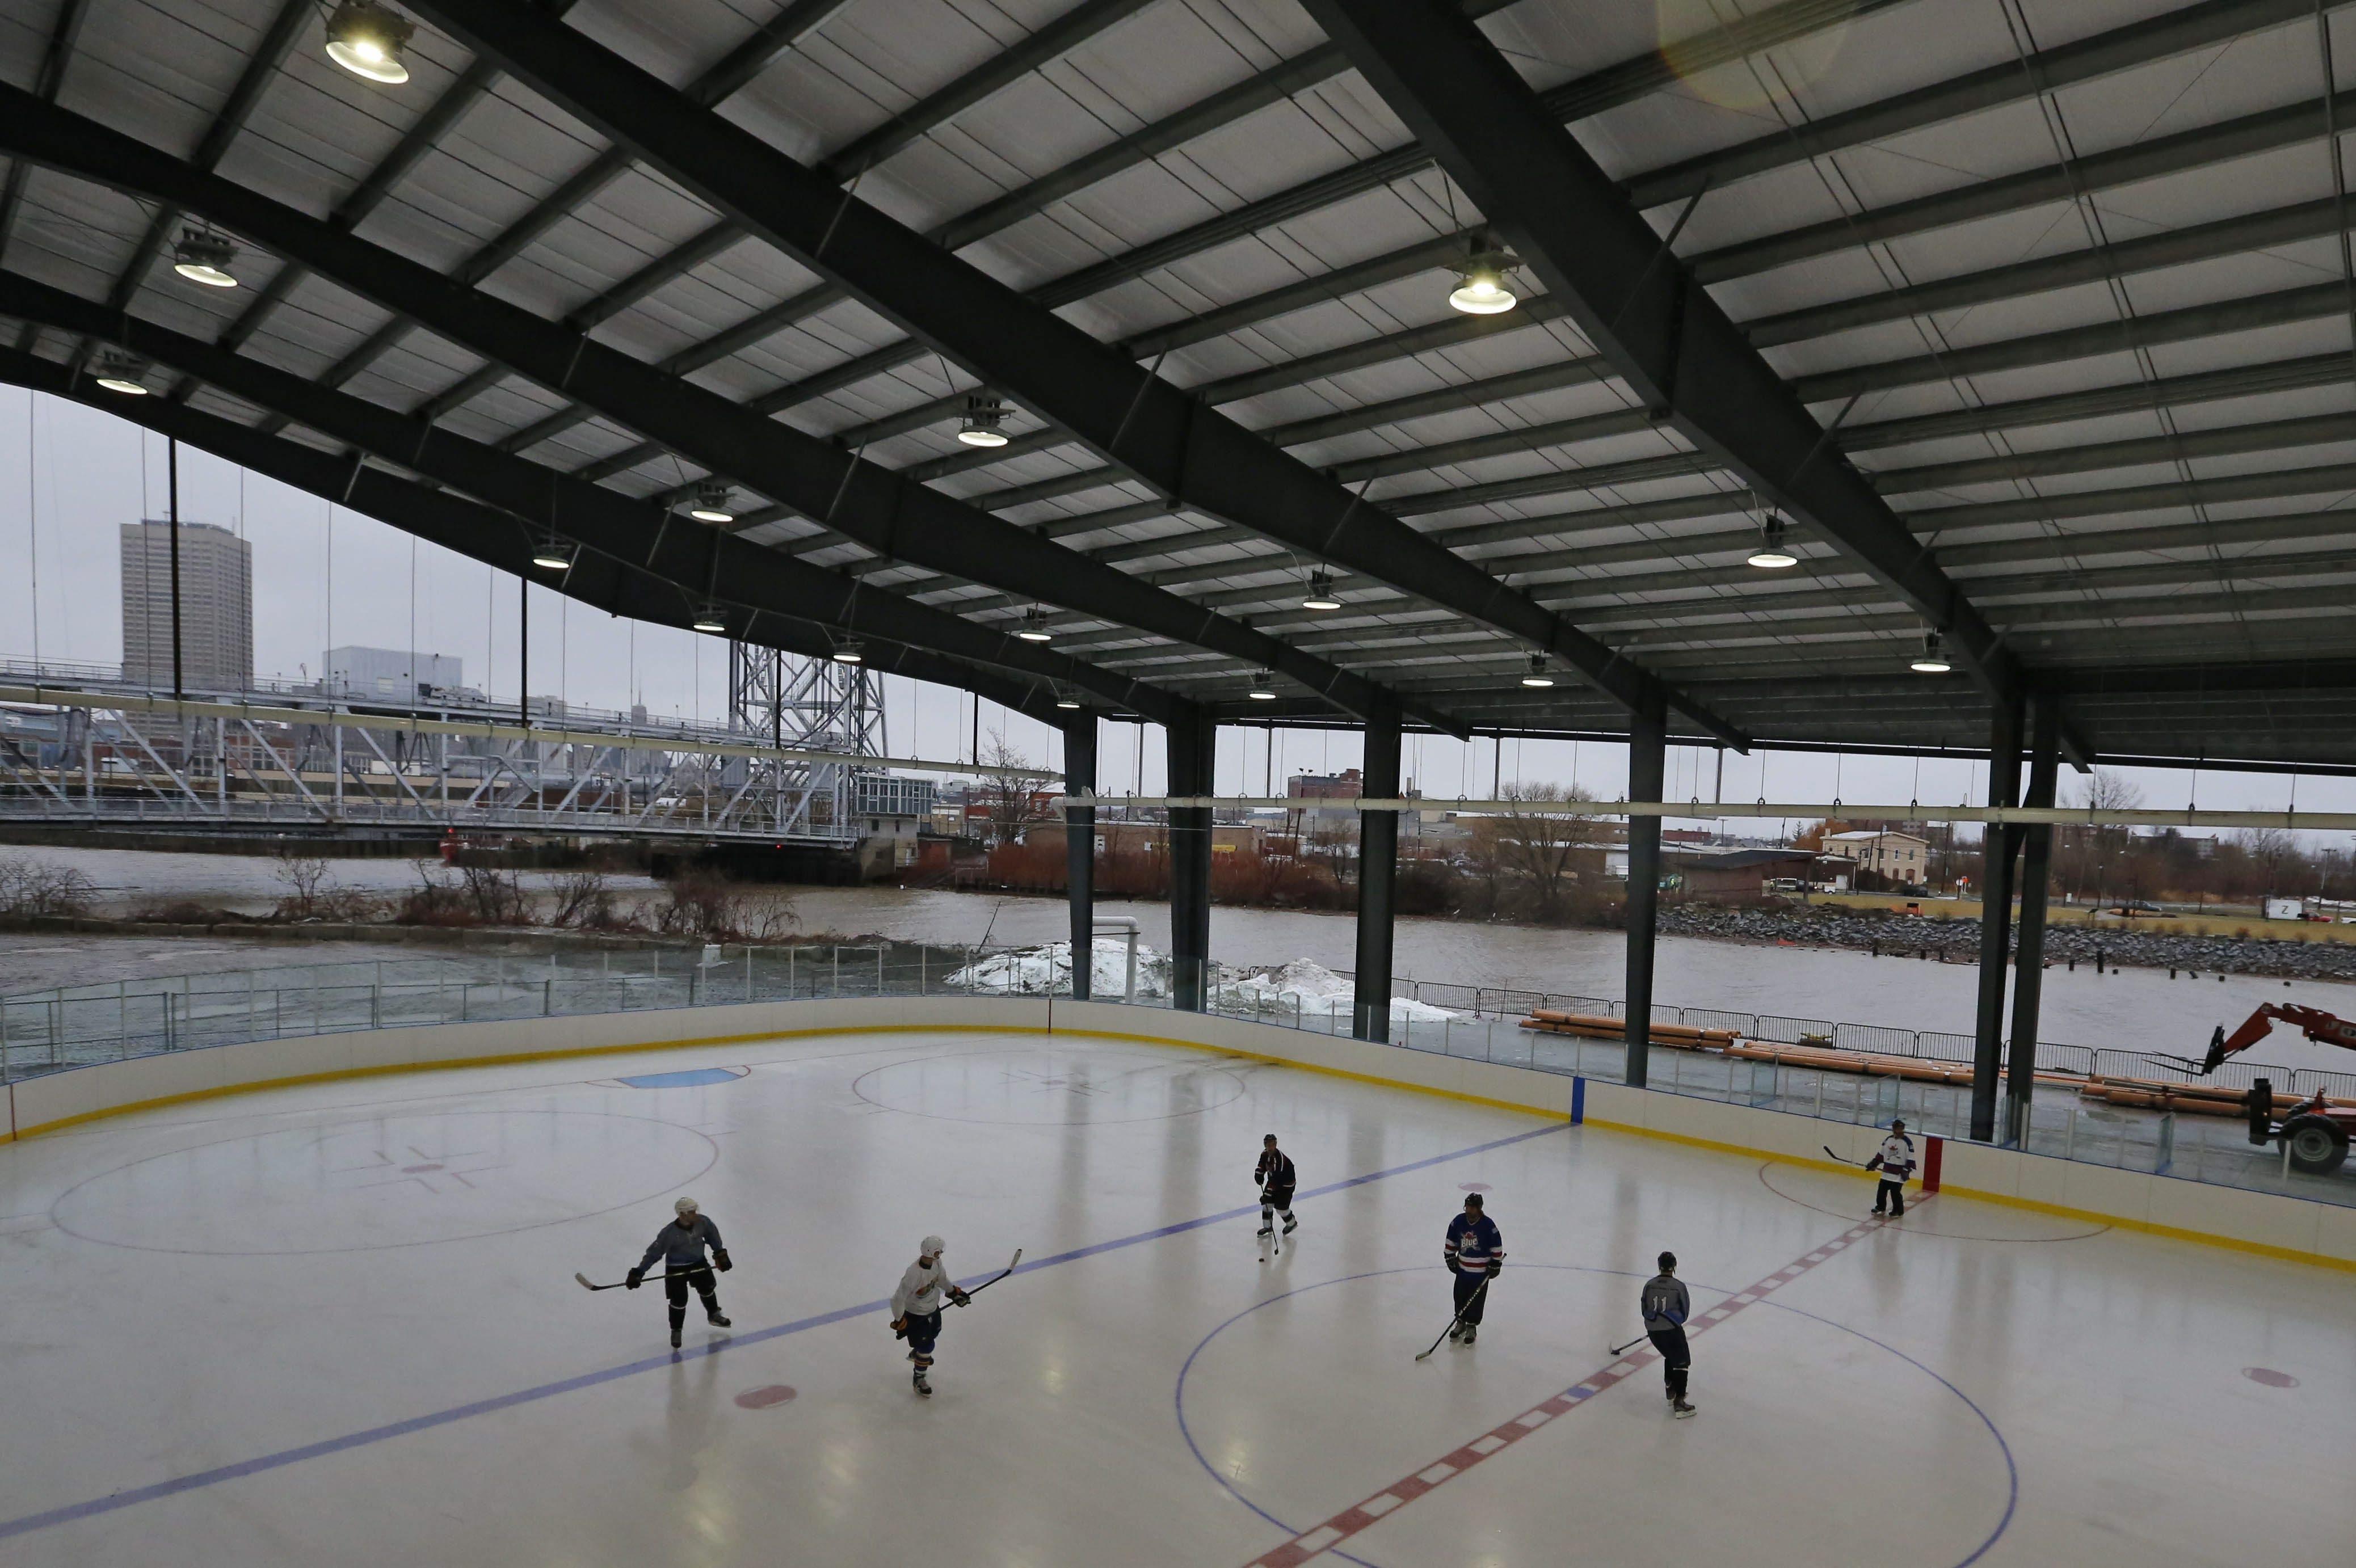 Expanded Pond Hockey Tournament Set For February The Buffalo News